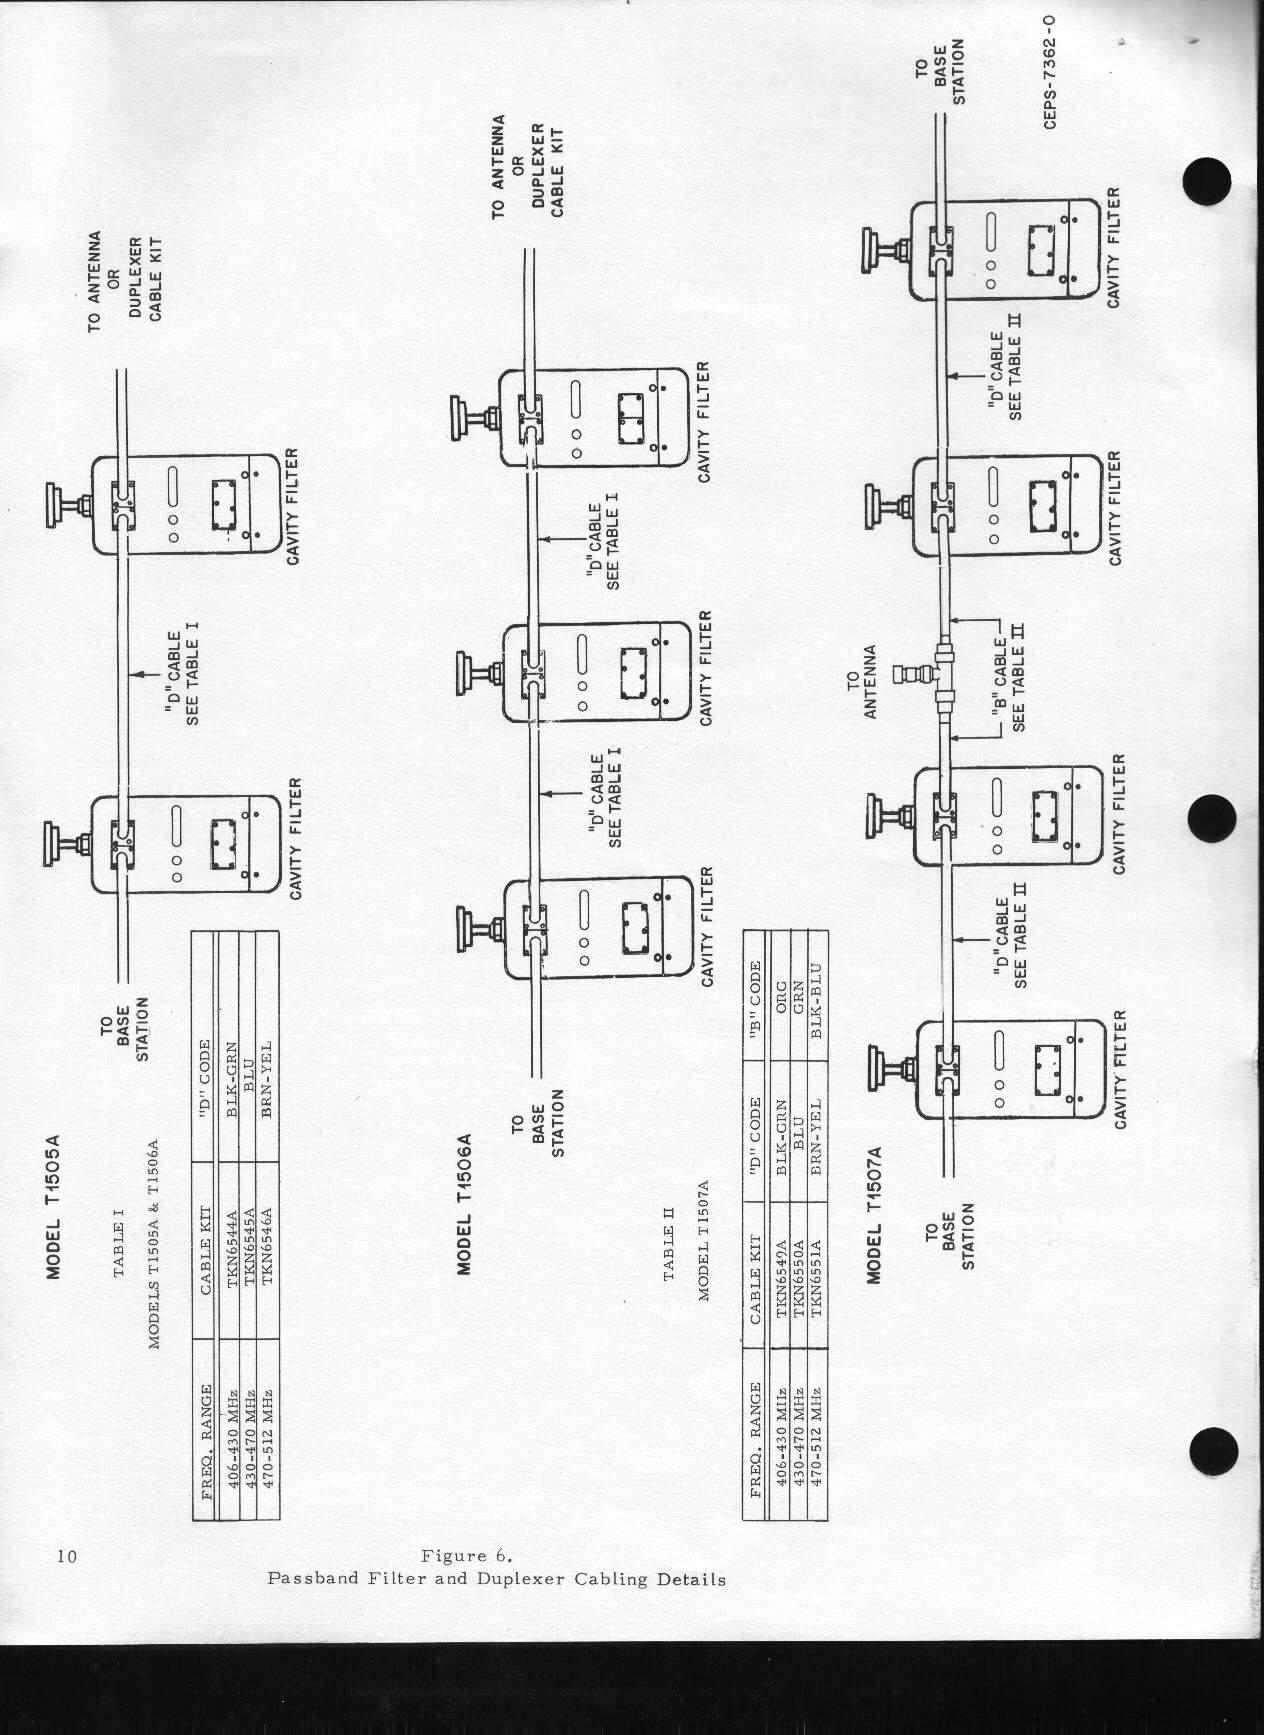 Motorola® T1500 Duplexer / Cavity Filter information